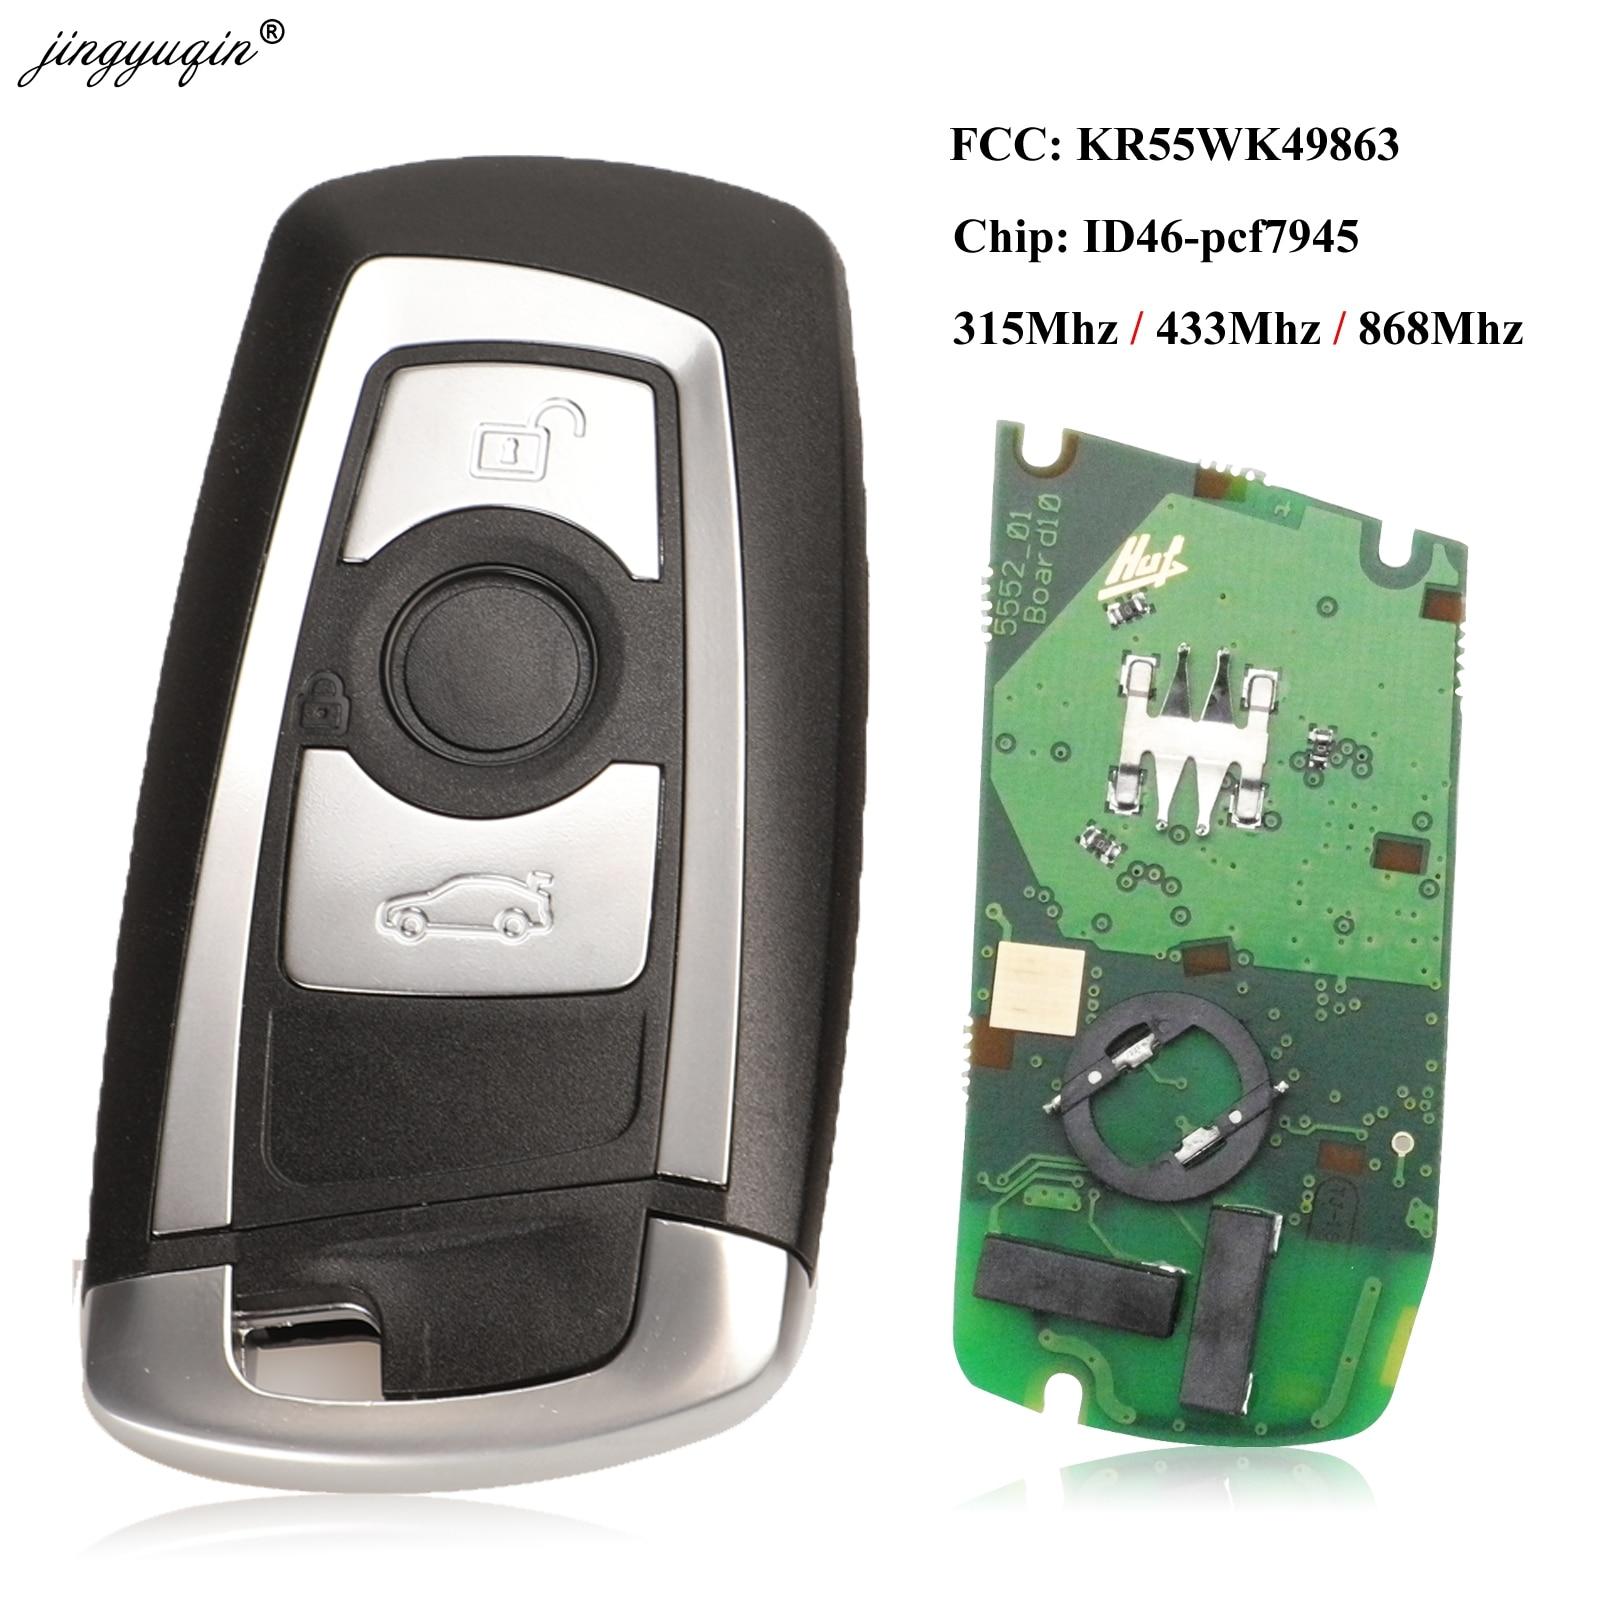 Jingyuqin 315/433/868Mhz CAS4 الذكية مفتاح بعيد Keytless الدخول ل BMW 3 5 7 سلسلة 523 528 535 550 318 320 325 328 330 PCF7945